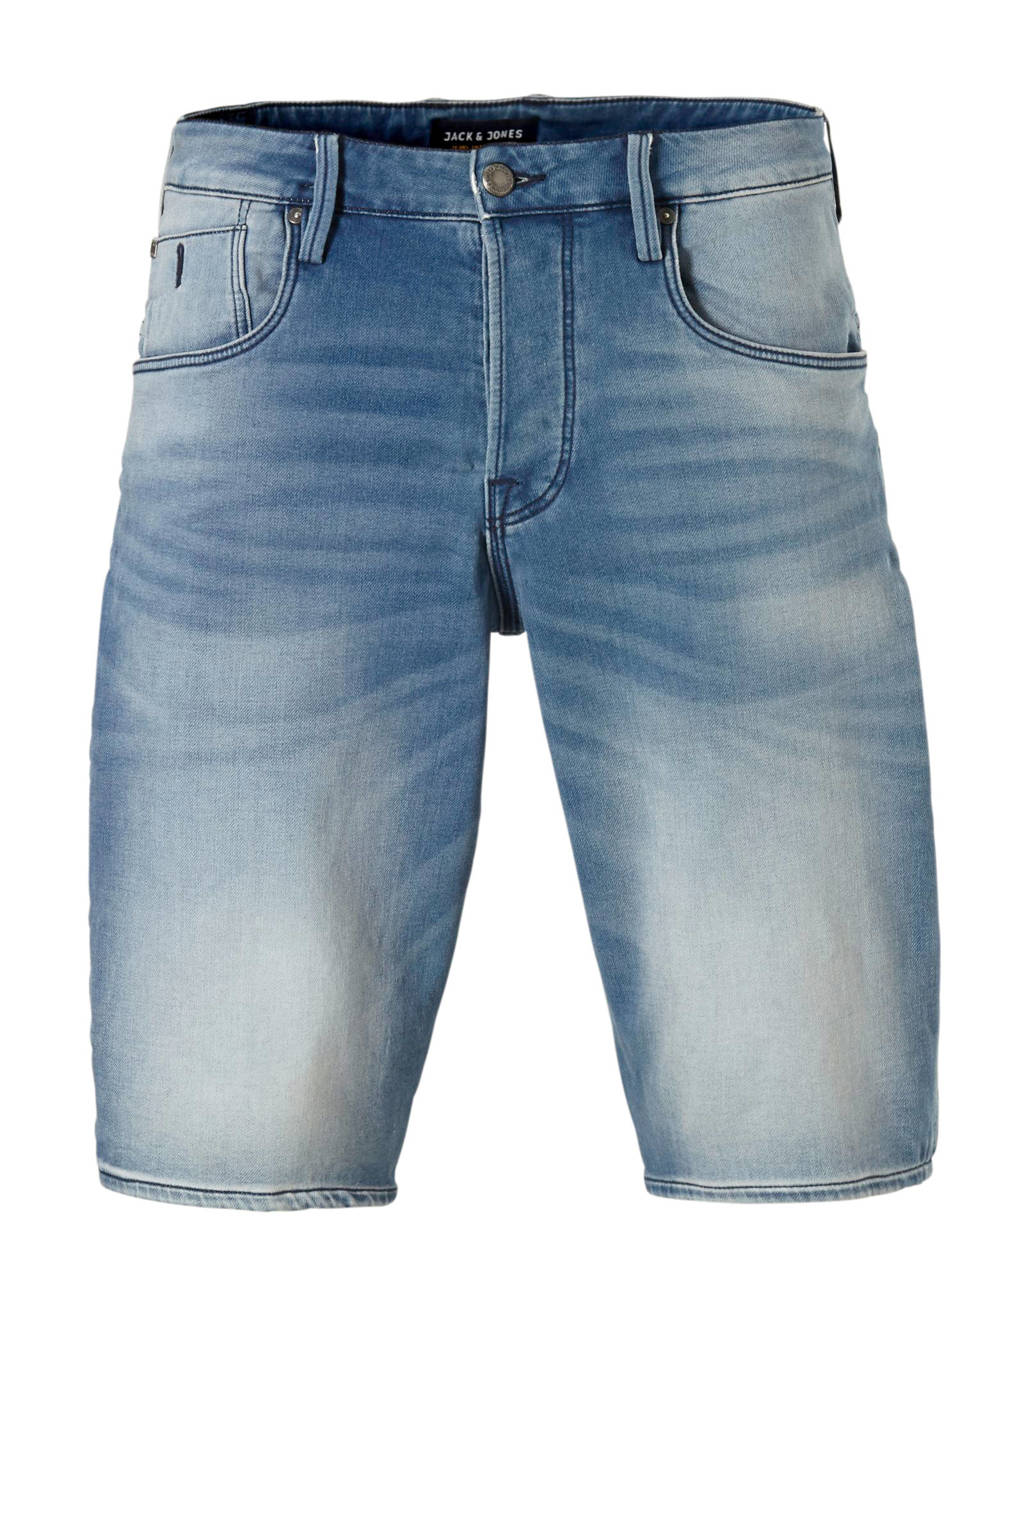 Jack & Jones Jeans Intelligence bermuda, Blauw